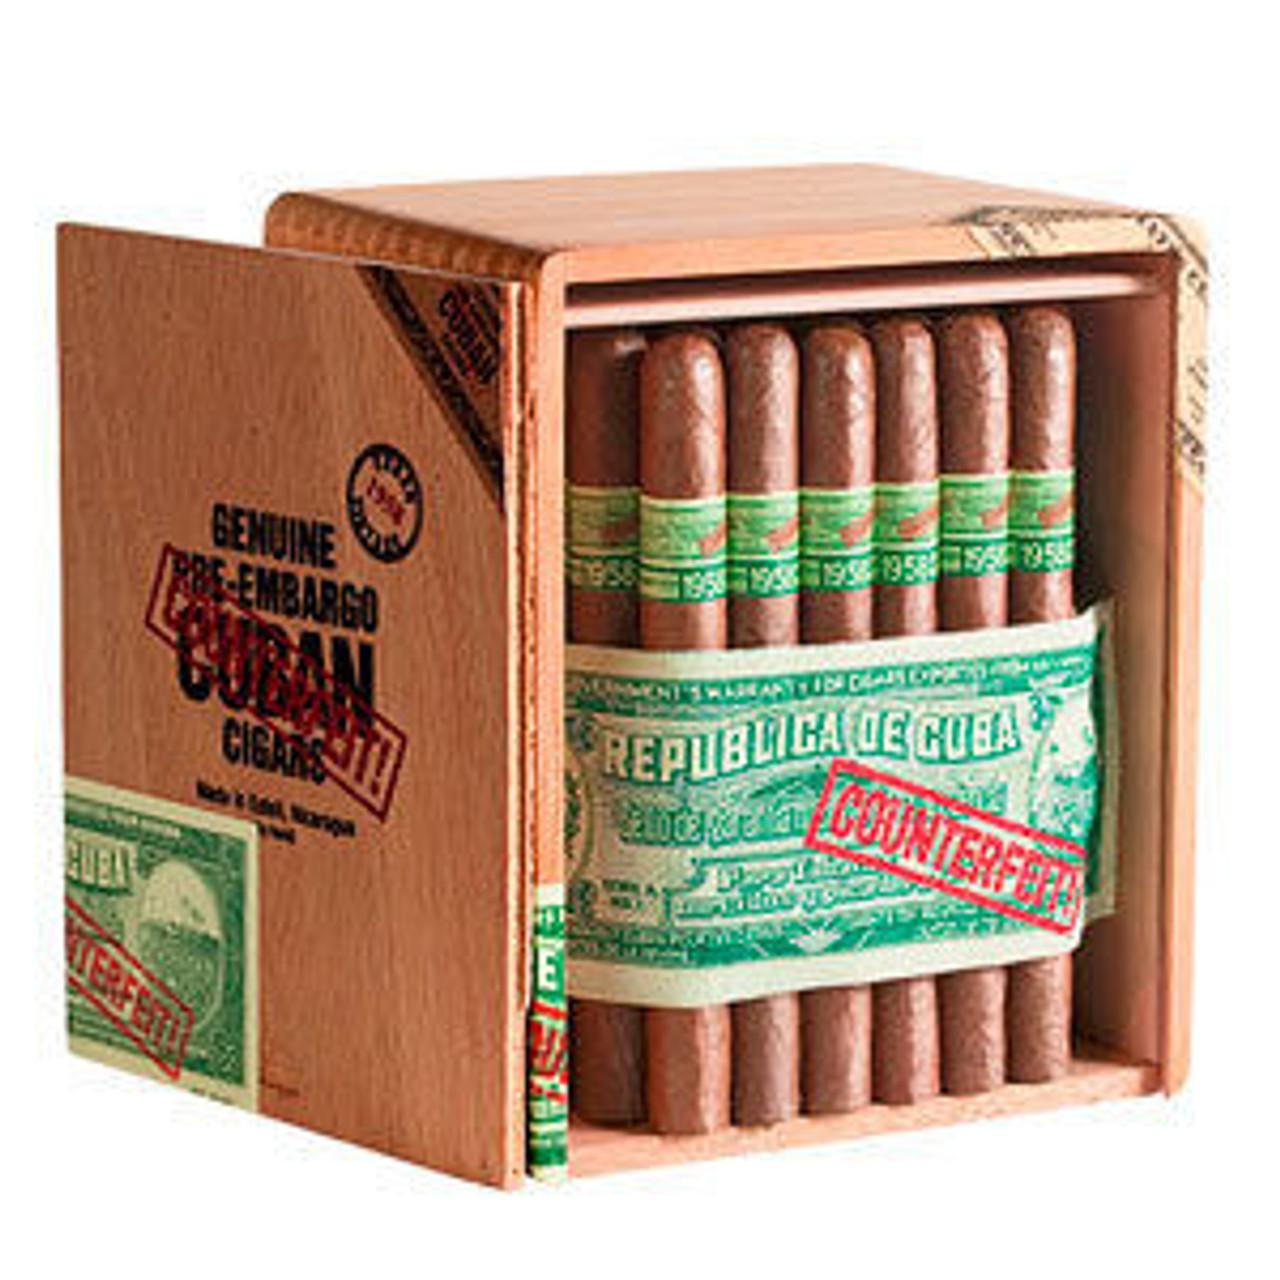 Genuine Pre-Embargo Counterfeit Cuban 1958 Epicure Cigars - 5.0 x 50 (Cedar Chest of 50)